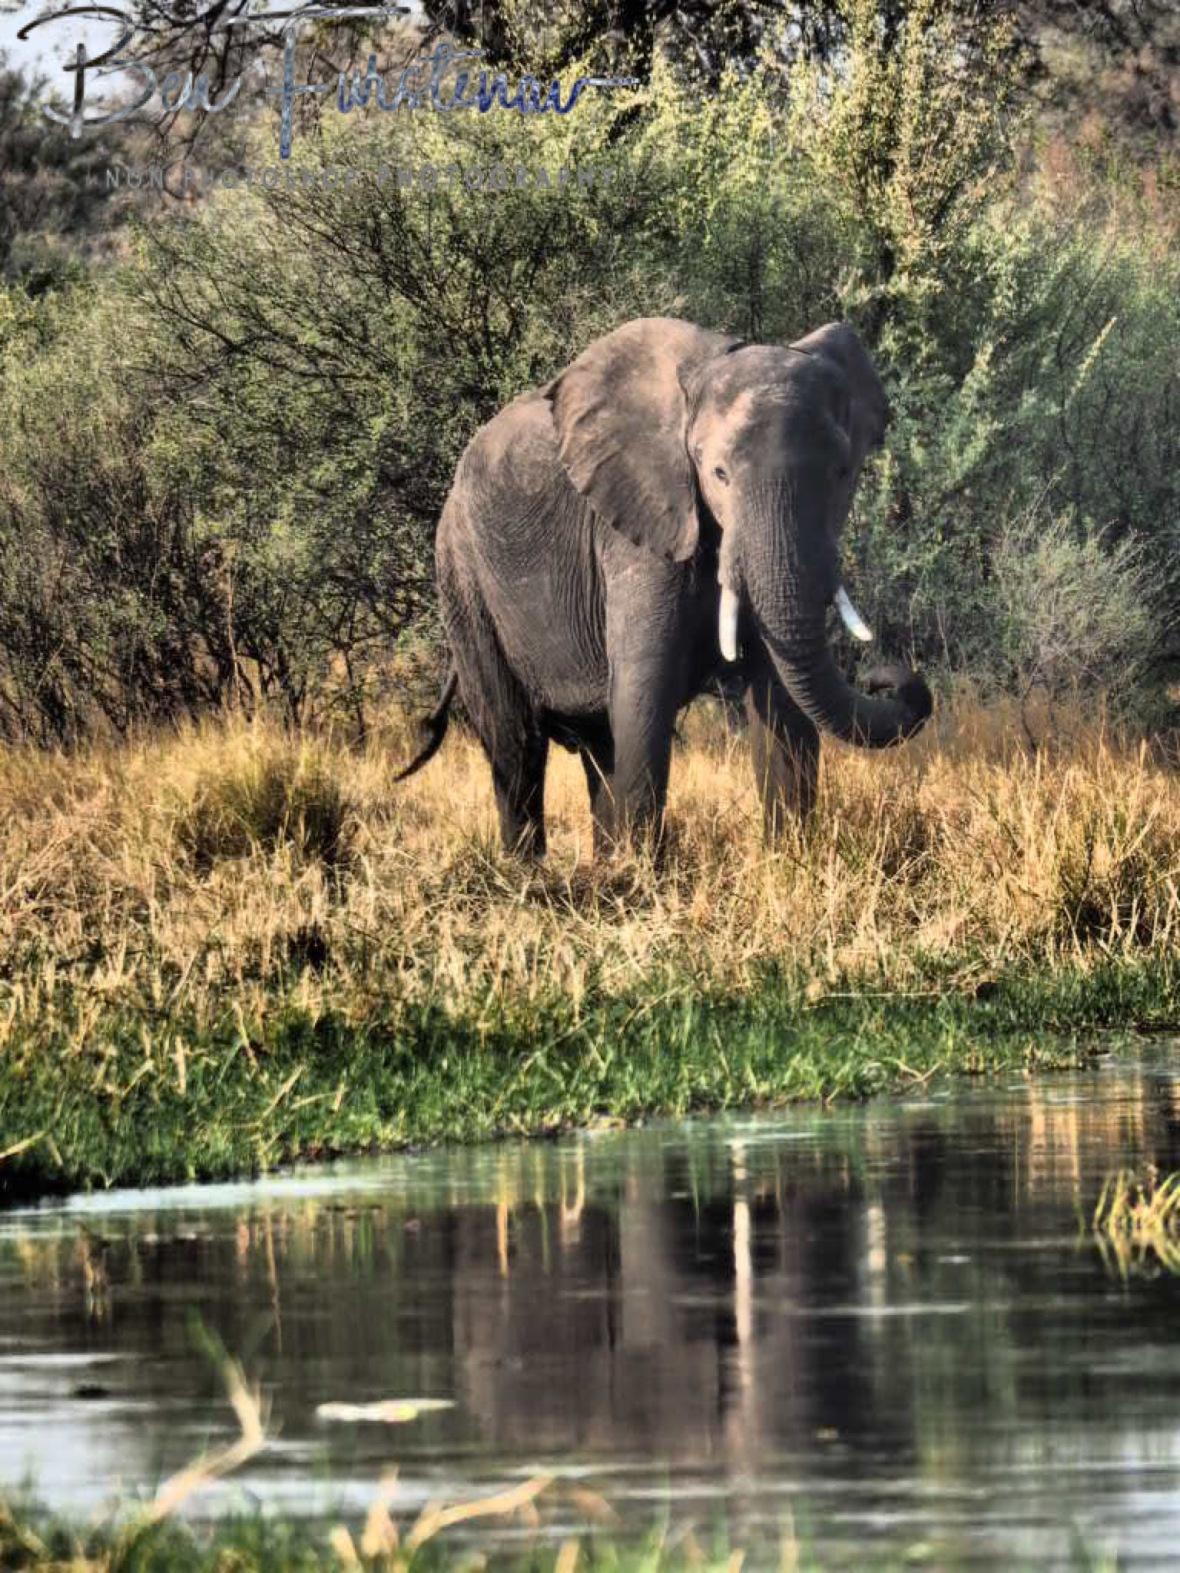 A vary elephant, Moremi National Park, Botswana